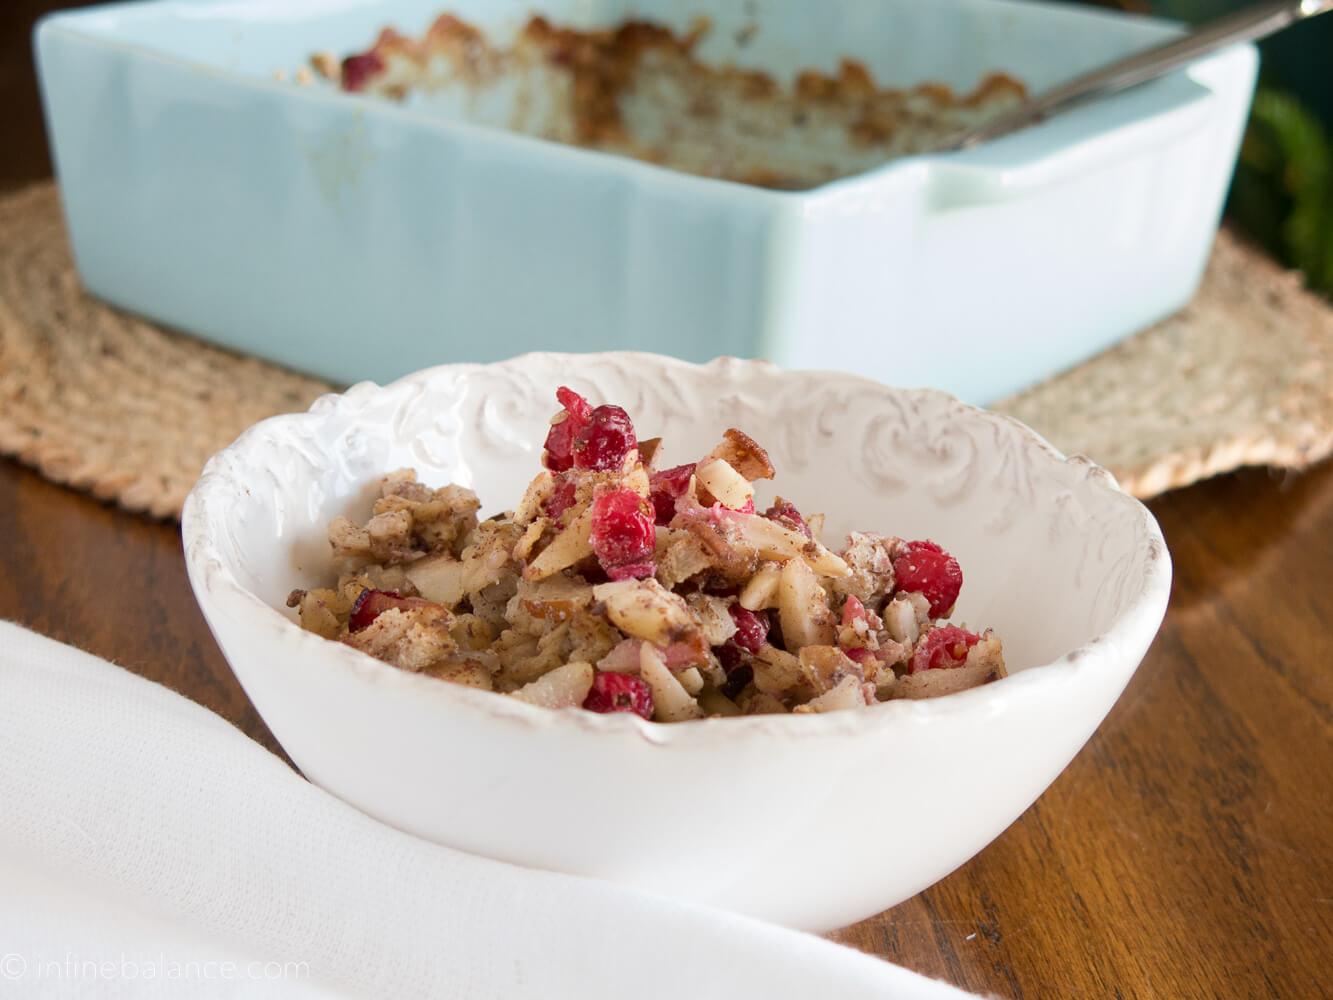 Cranberry and Pear Baked Oatmeal   www.infinebalance.com Breakfast recipe. Vegan